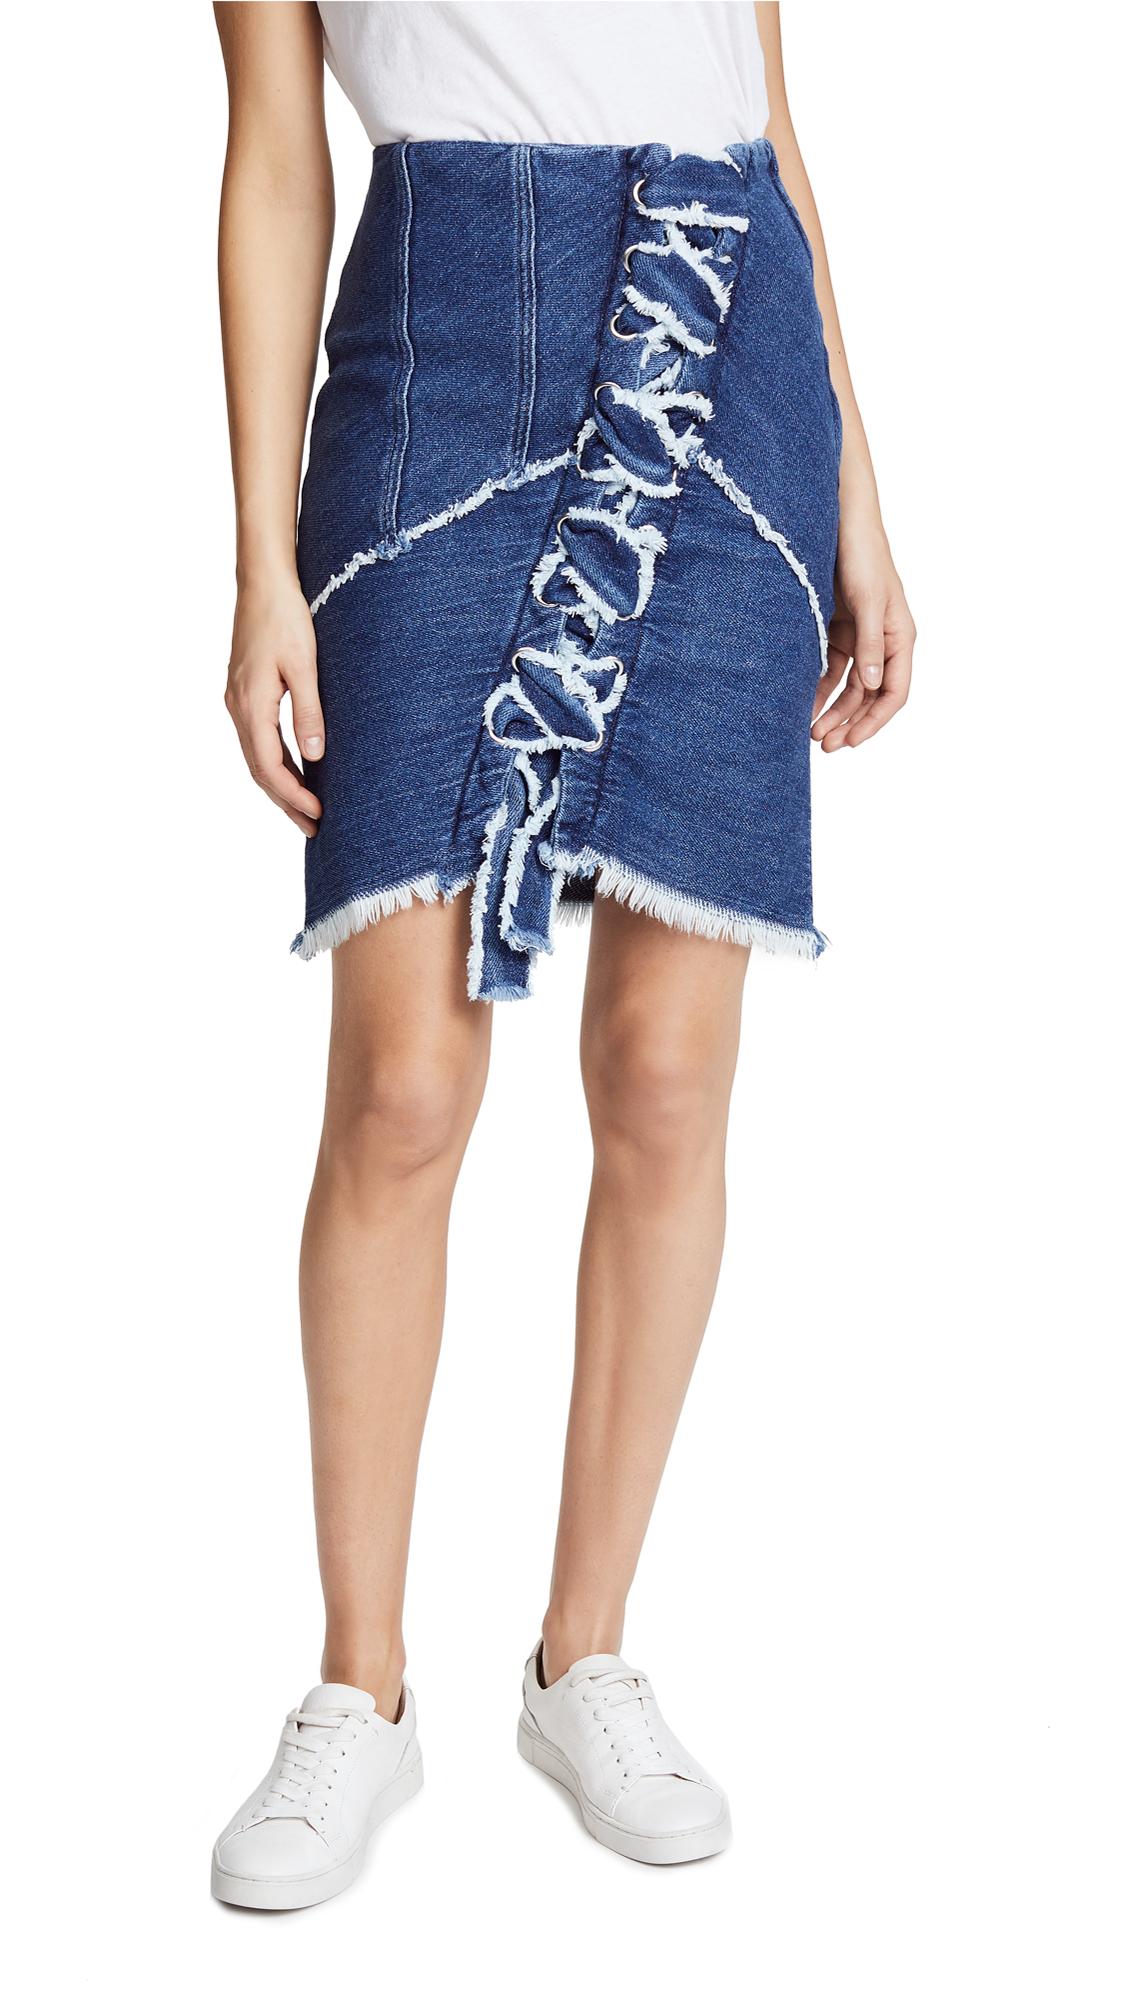 IRO Boston Denim Skirt In Blue